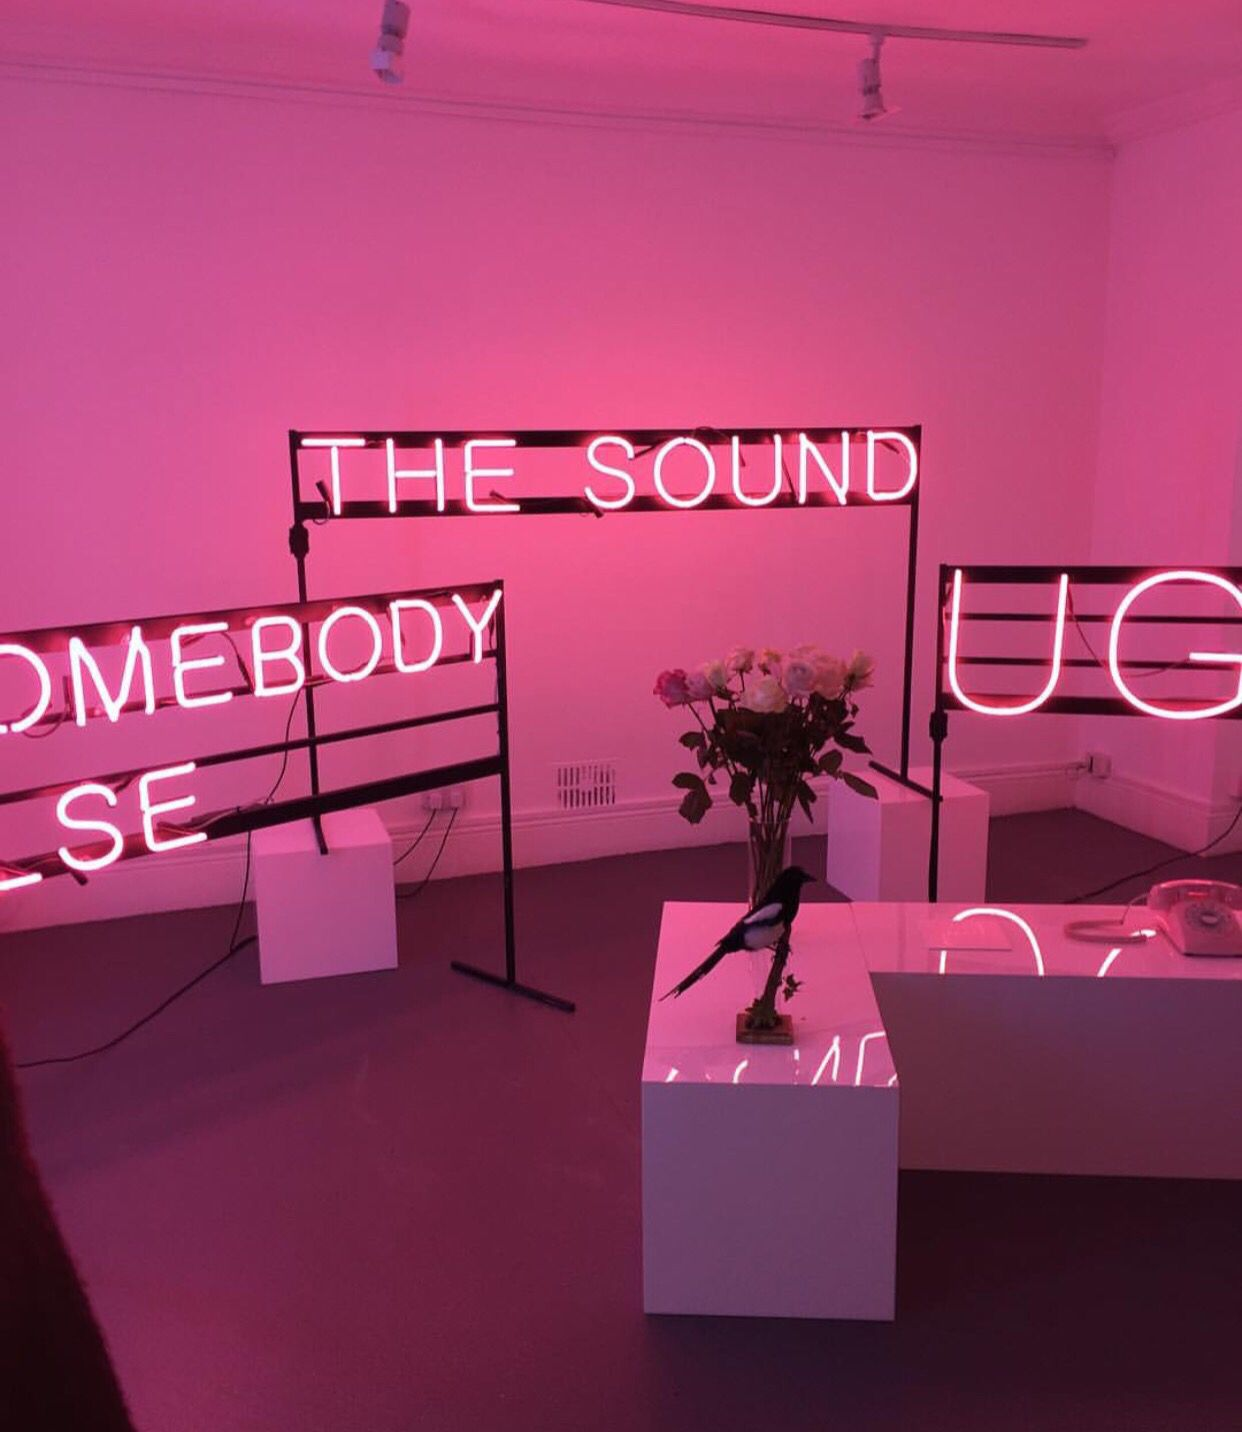 "The 1975 Neon Sign Stunning ❀_""s̶a̶w̶ Y̶o̶u̶r̶ F̶a̶c̶e̶ A̶n̶d̶ G̶o̶t̶ I̶n̶s̶p̶i̶r̶e̶d̶_ Decorating Design"